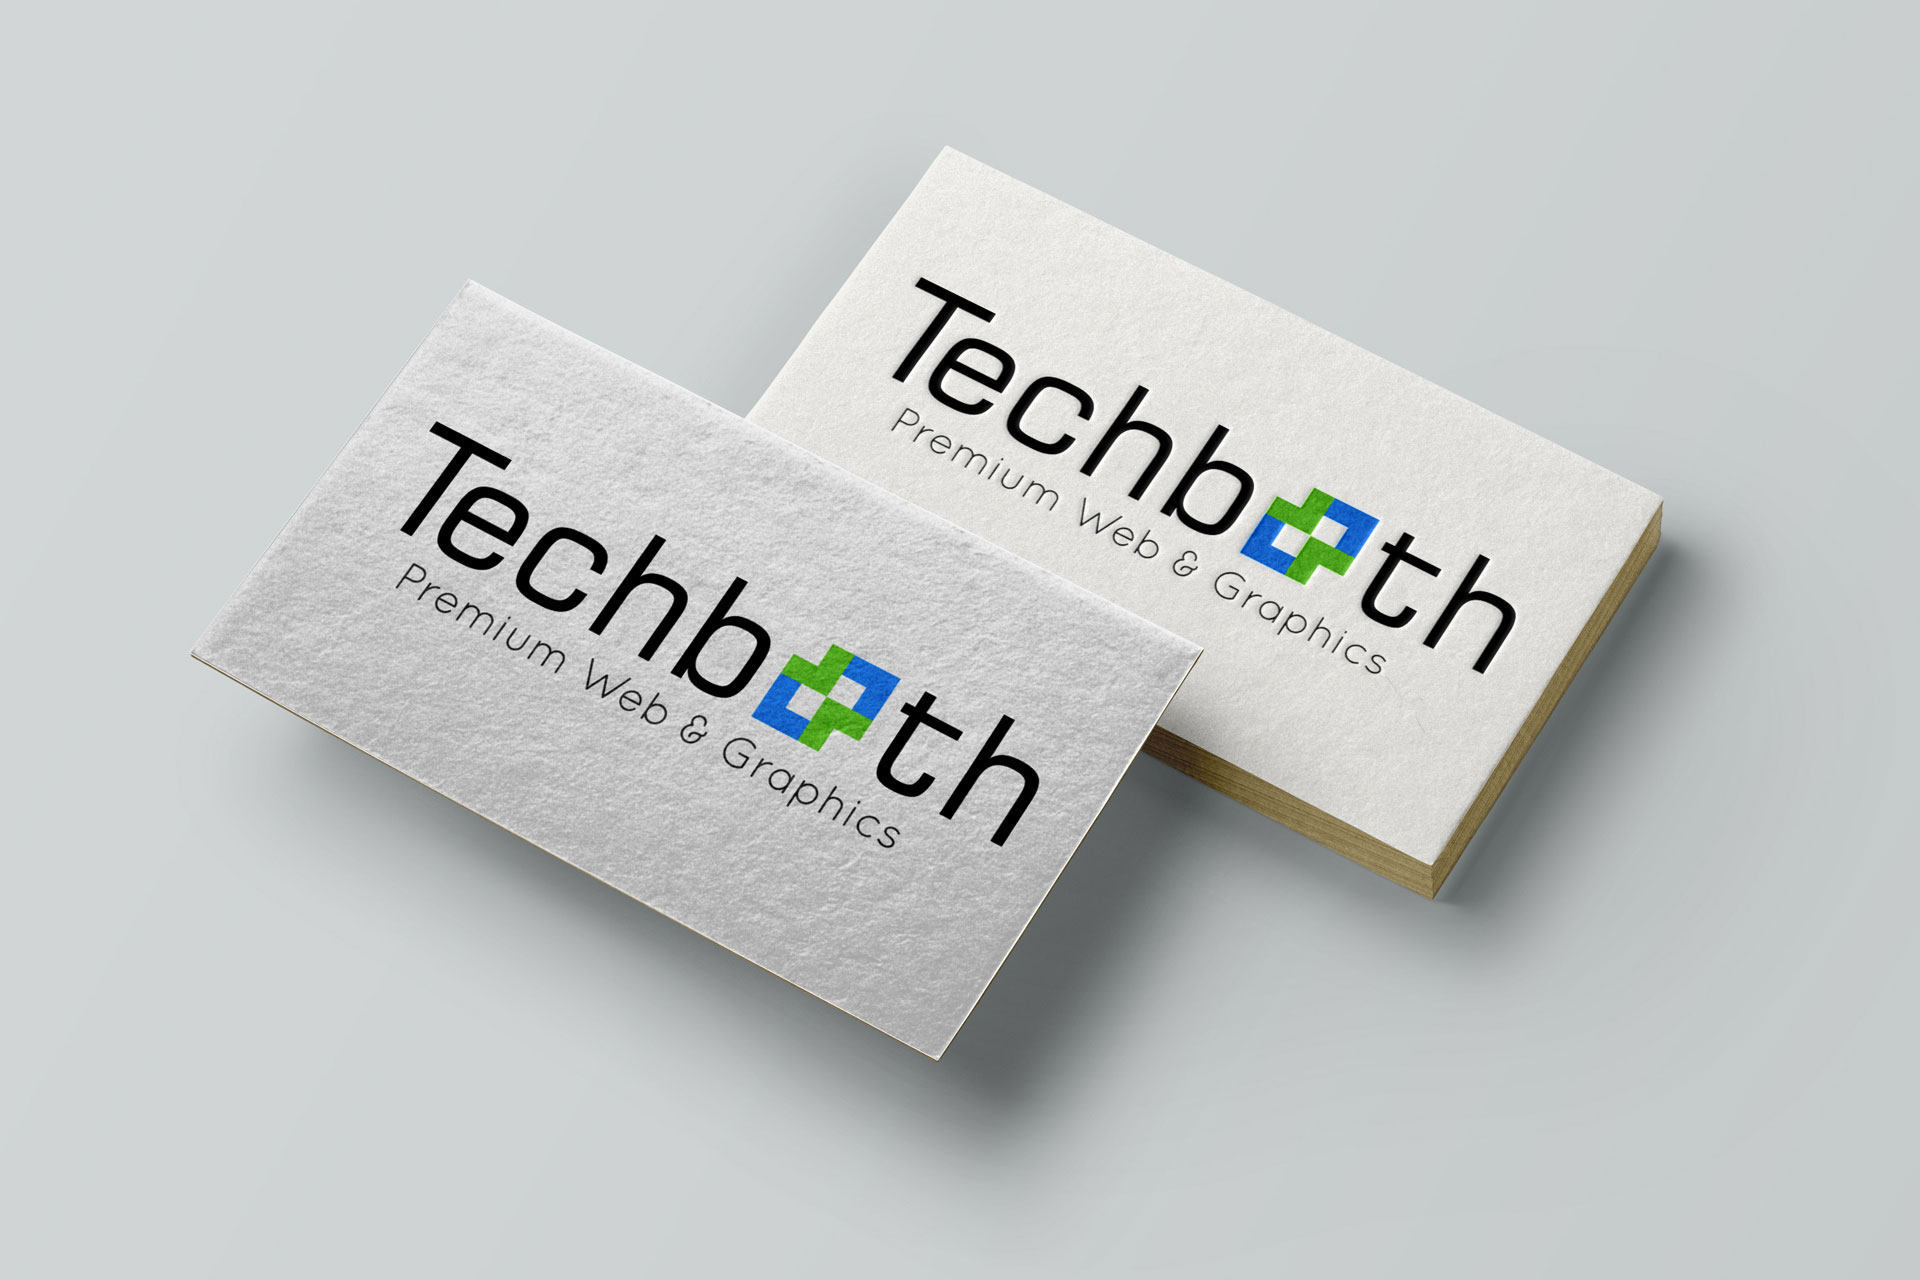 TechBooth - Graphic Design Portfolio